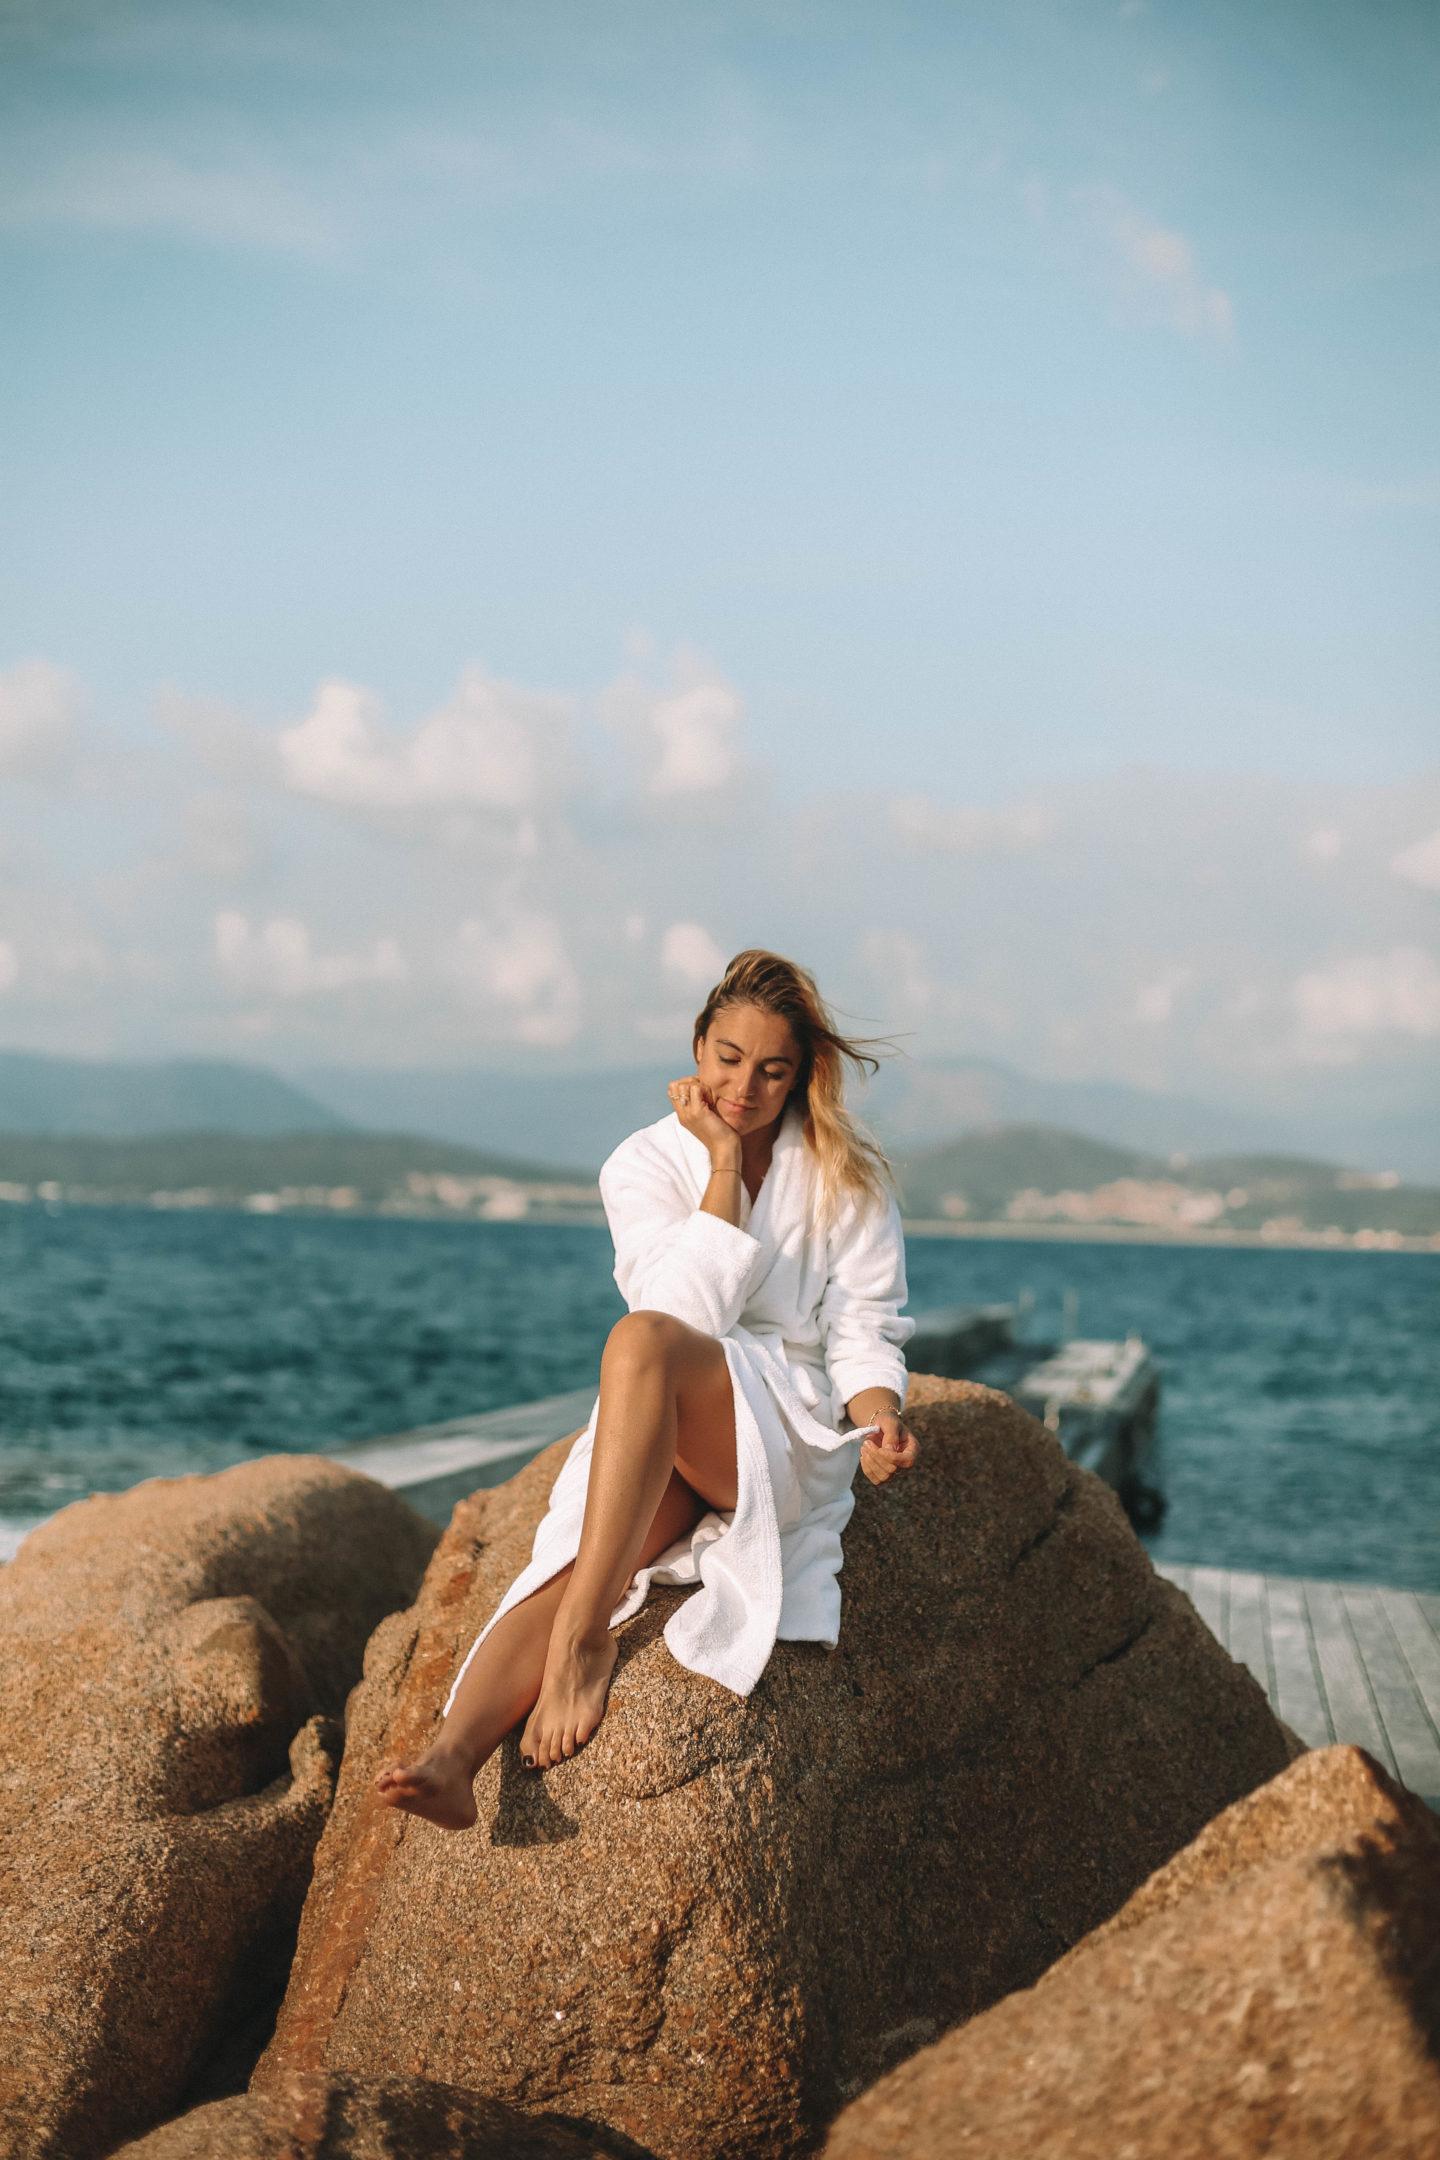 Golfe d'Ajaccio - Blondie baby blog mode et voyages